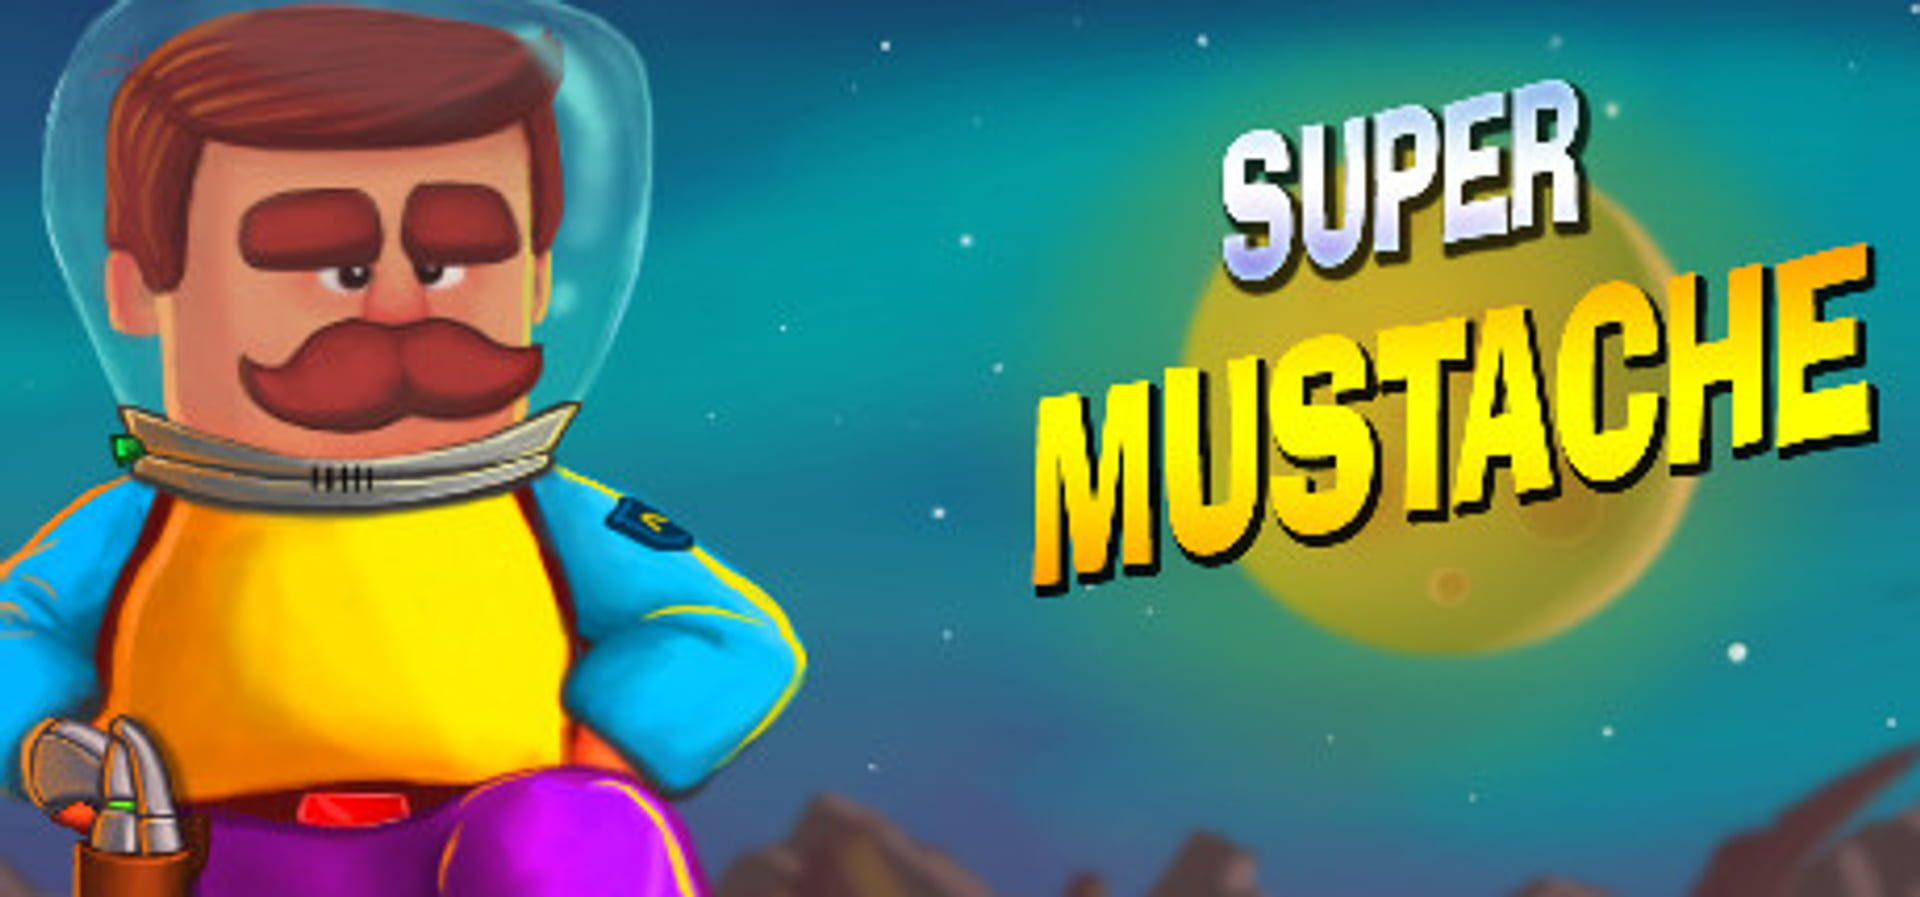 buy Super Mustache cd key for all platform